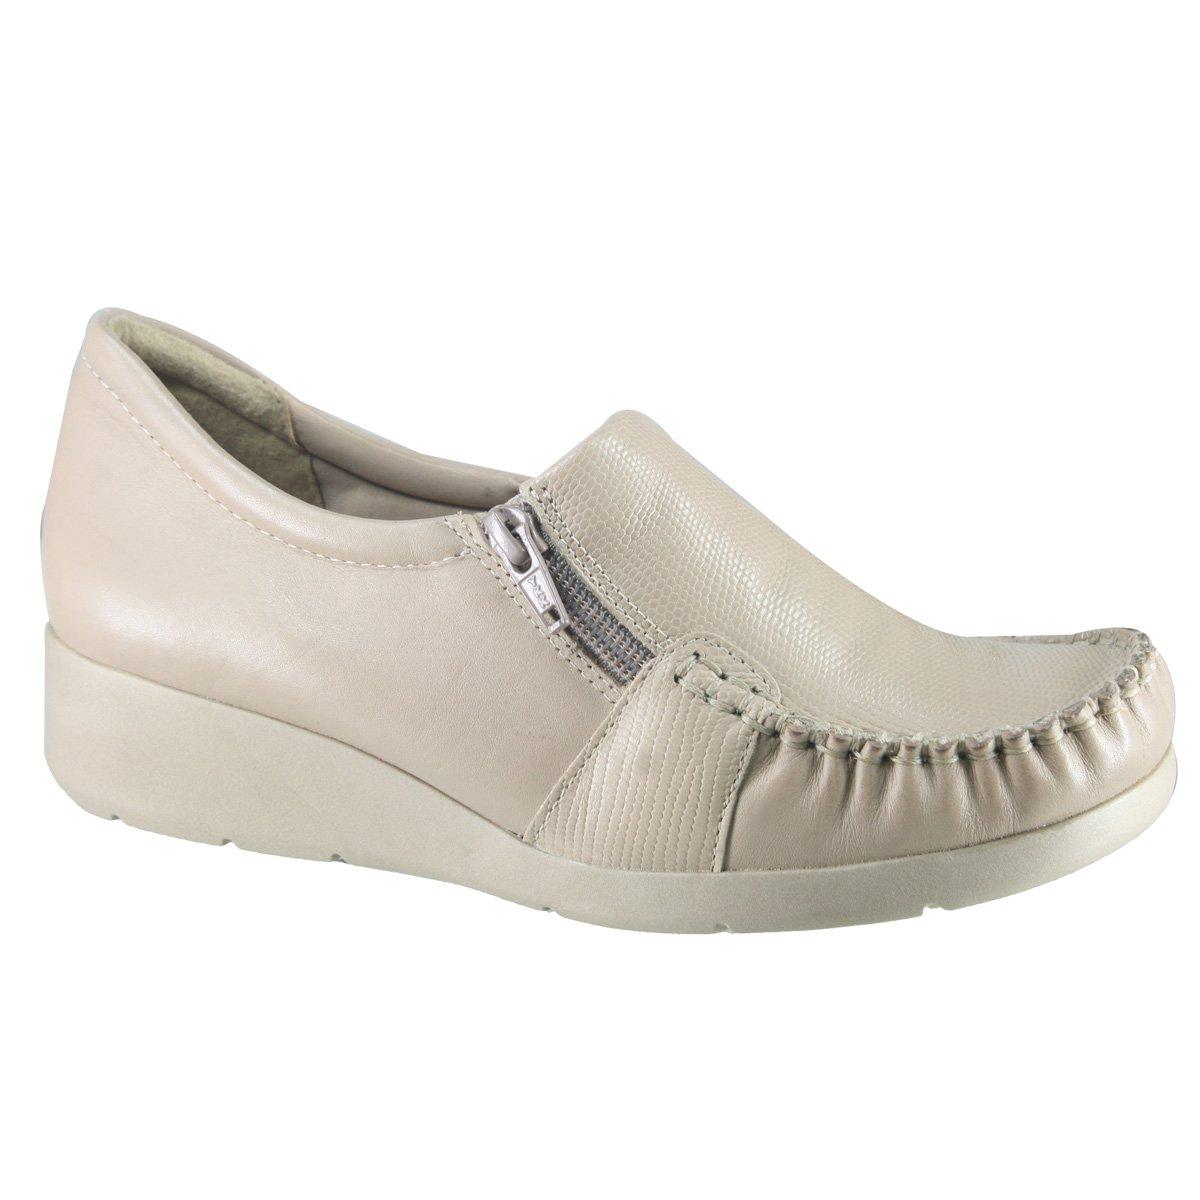 63ae4957b3 Sapato Feminino Comfortflex 18-93305 - Avela (Napa Vestuário ...